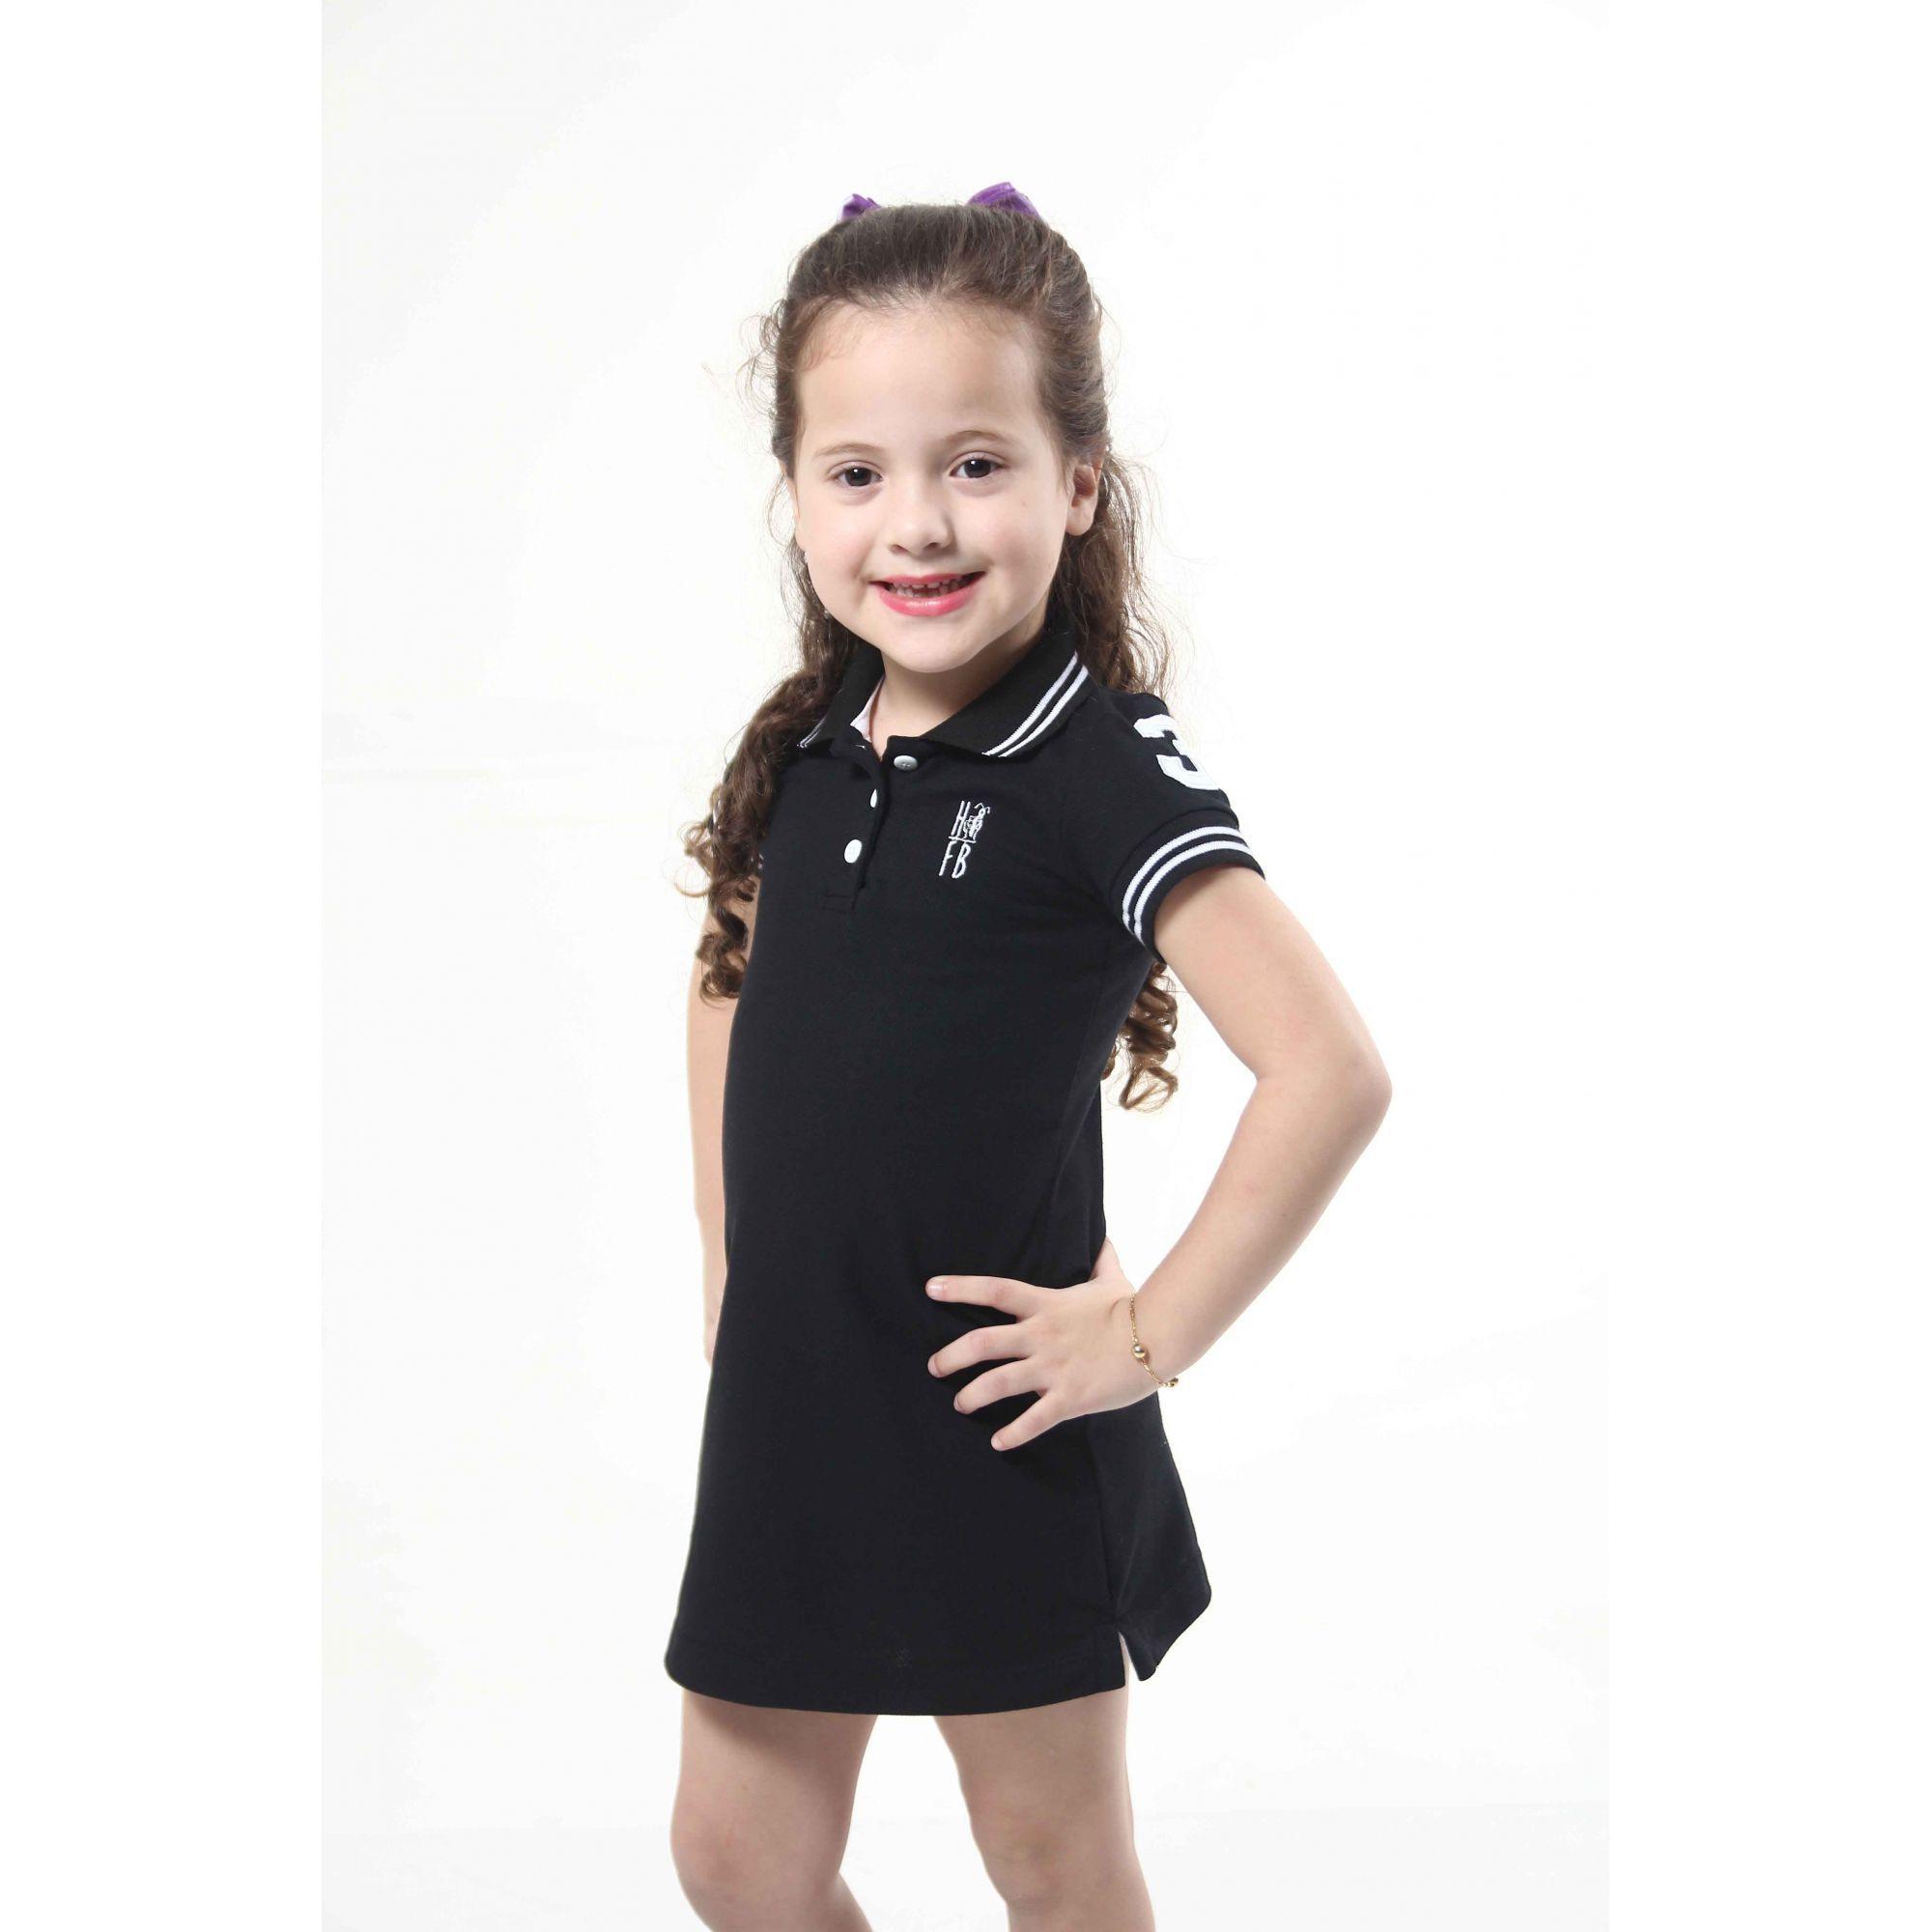 Vestido Polo Preto Elegância Infantil  - Heitor Fashion Brazil